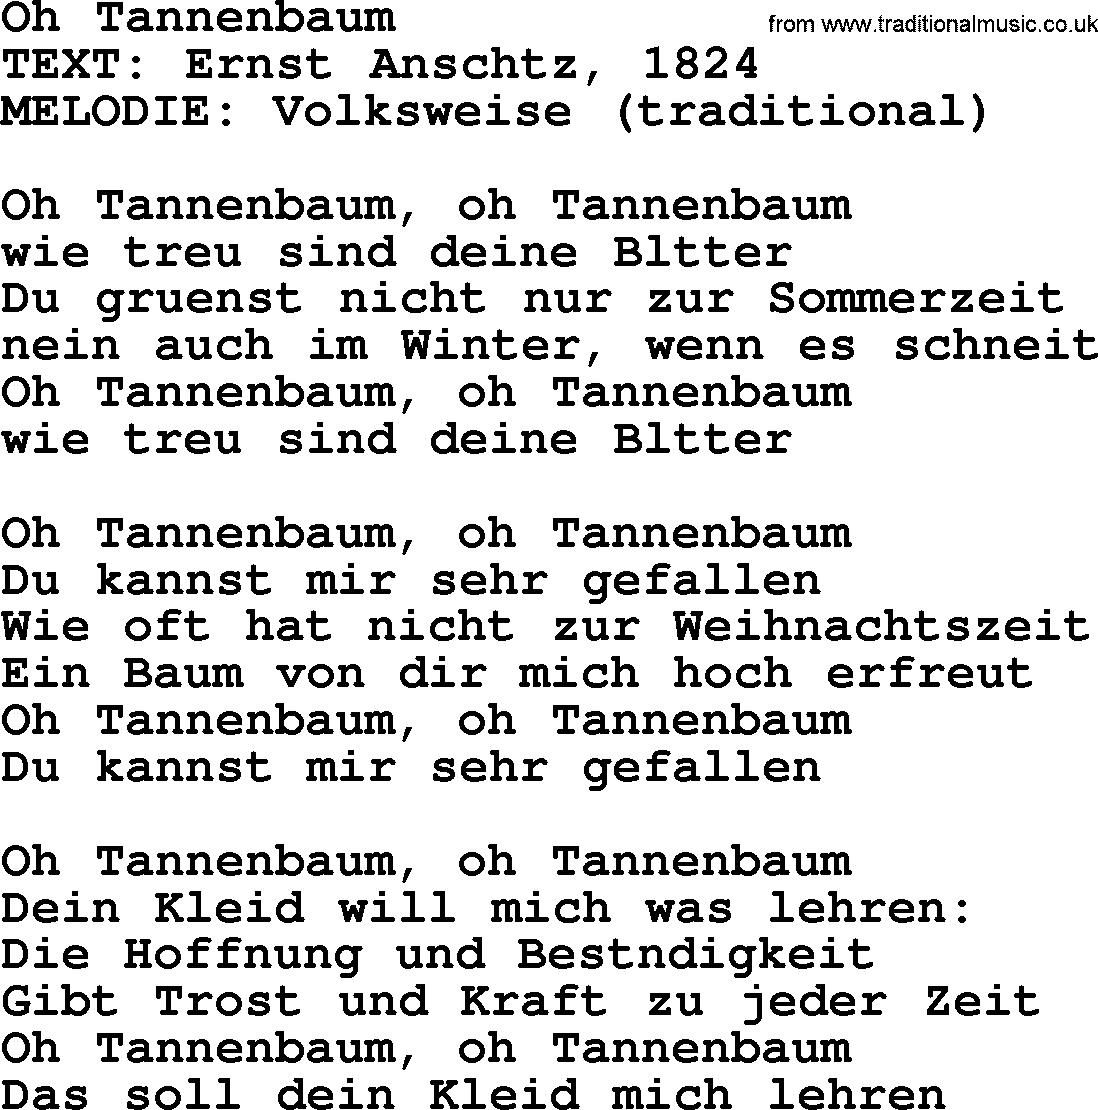 Traditional German Tannenbaum